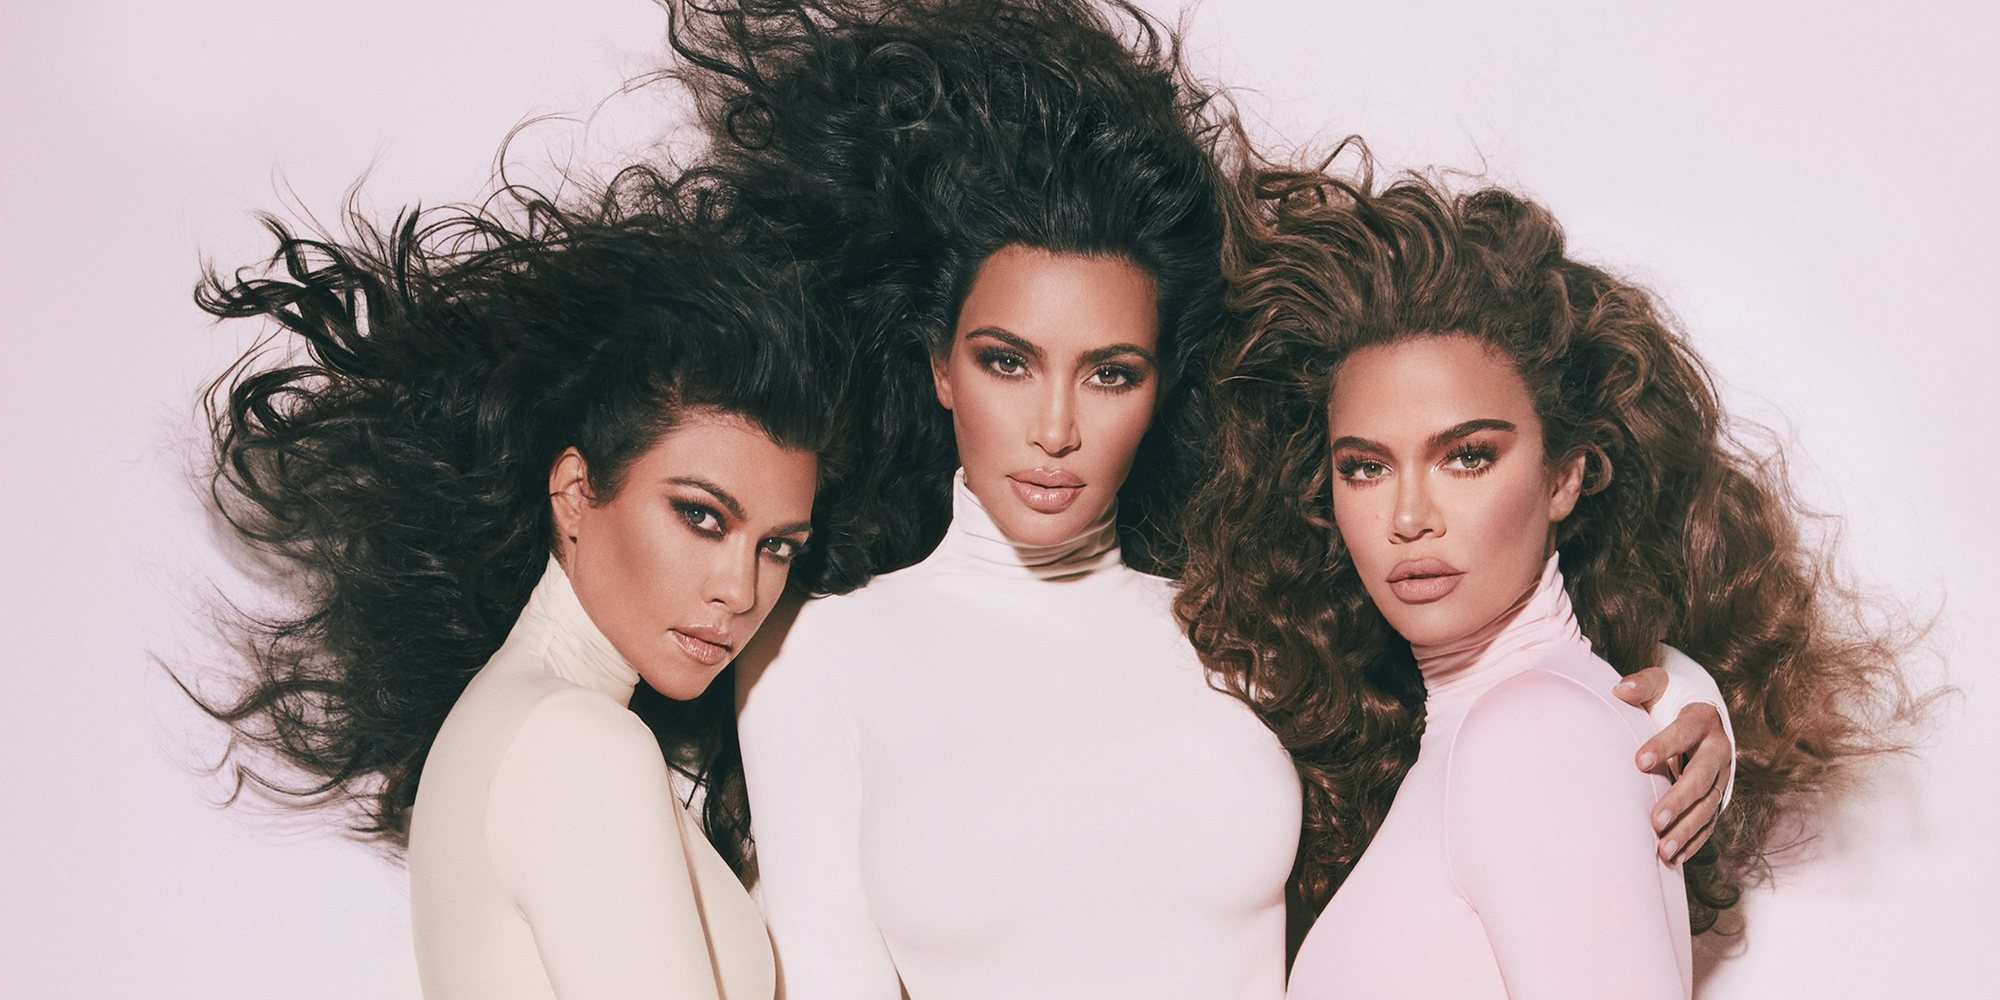 Kim y Khloé Kardashian despiden a Kourtney de 'Keeping Up With The Kardashian' por intentar ocultar su vida